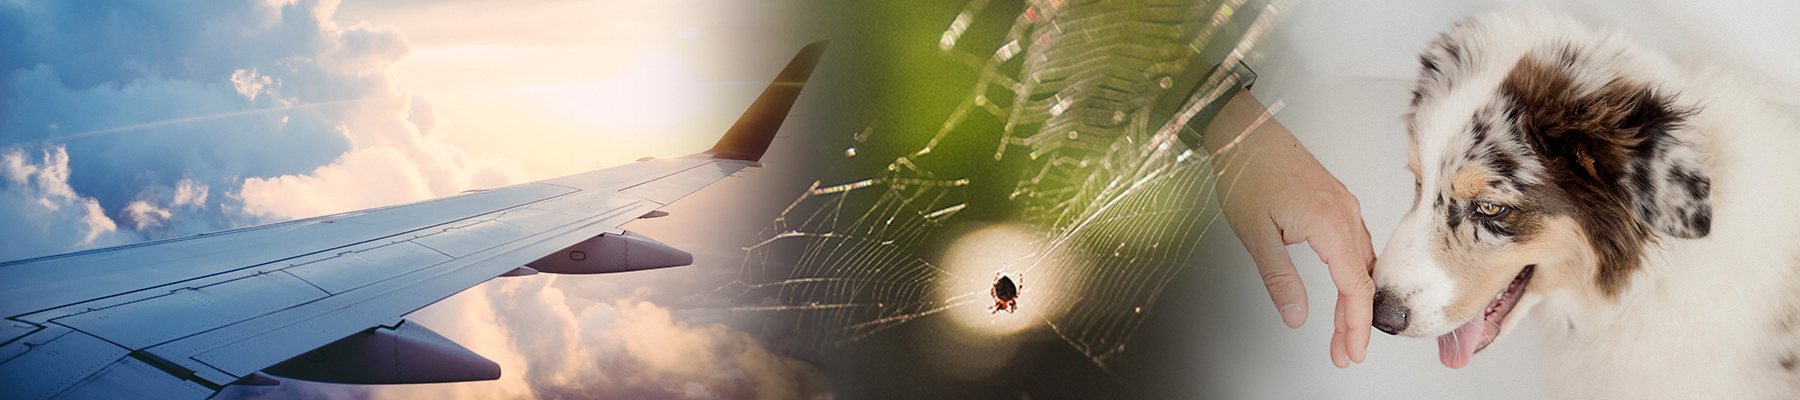 Spinne, Flugzeug